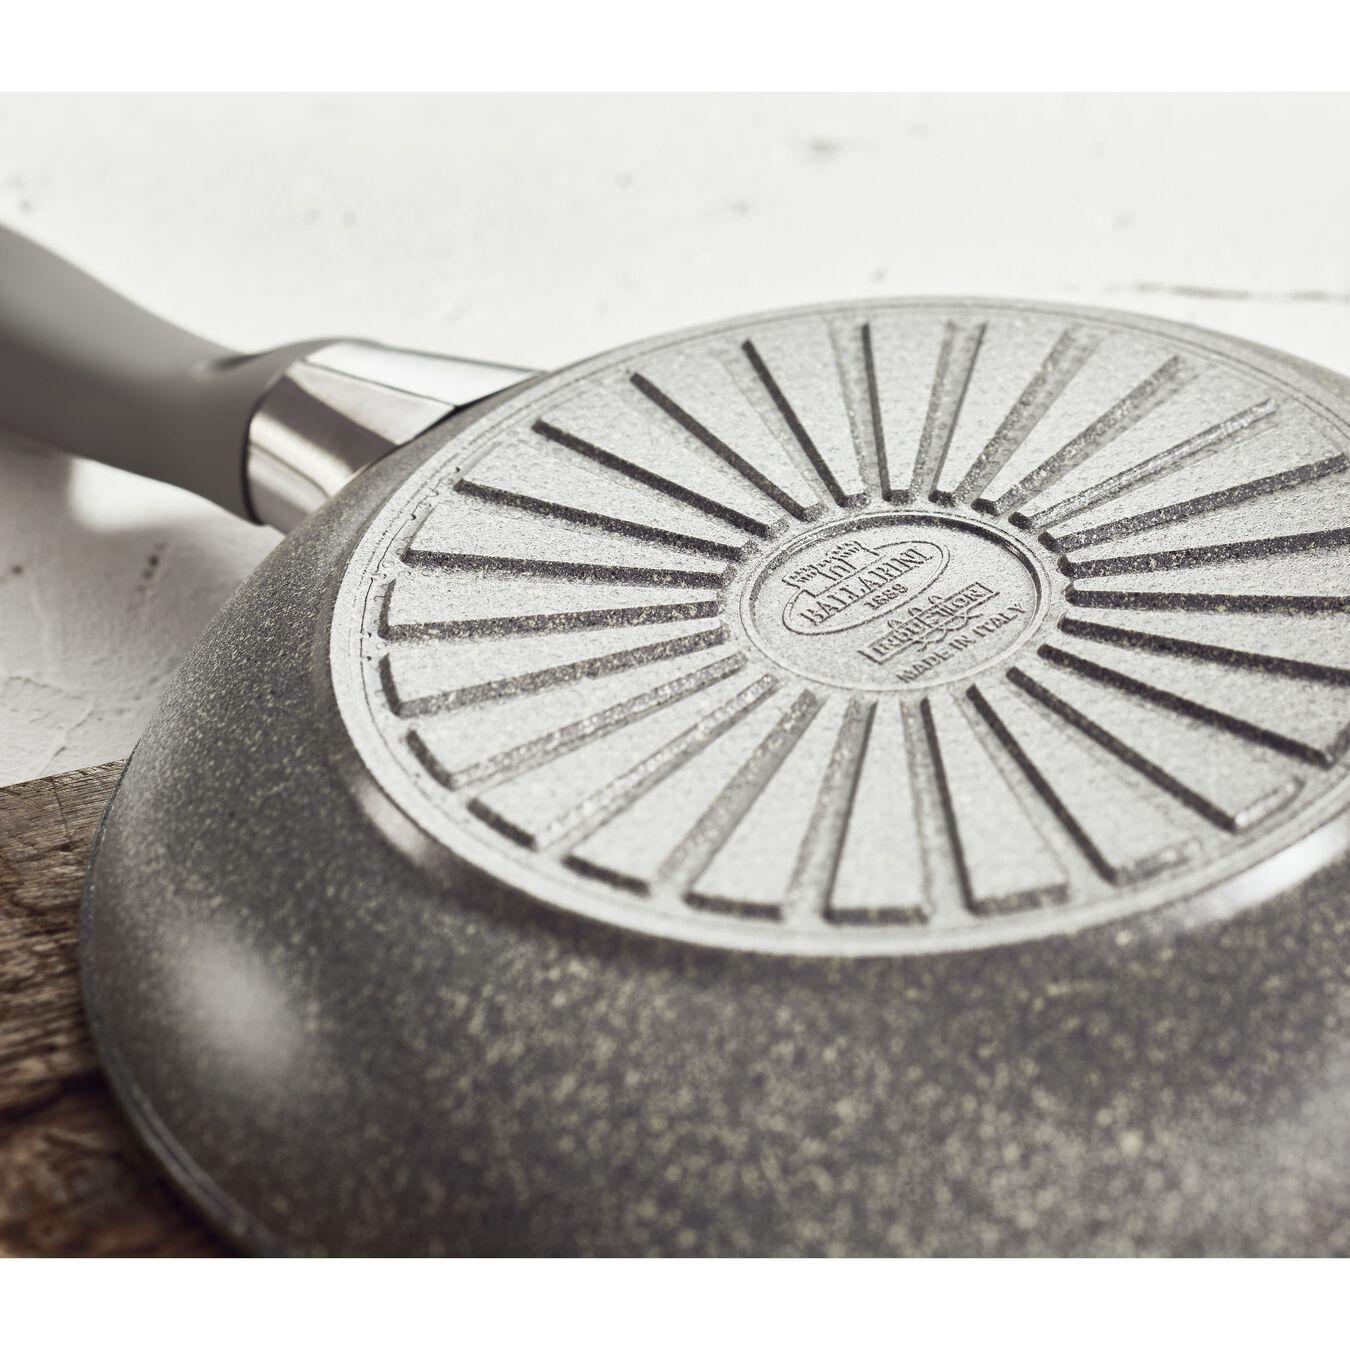 24 cm / 8 inch Aluminum Frying pan,,large 5